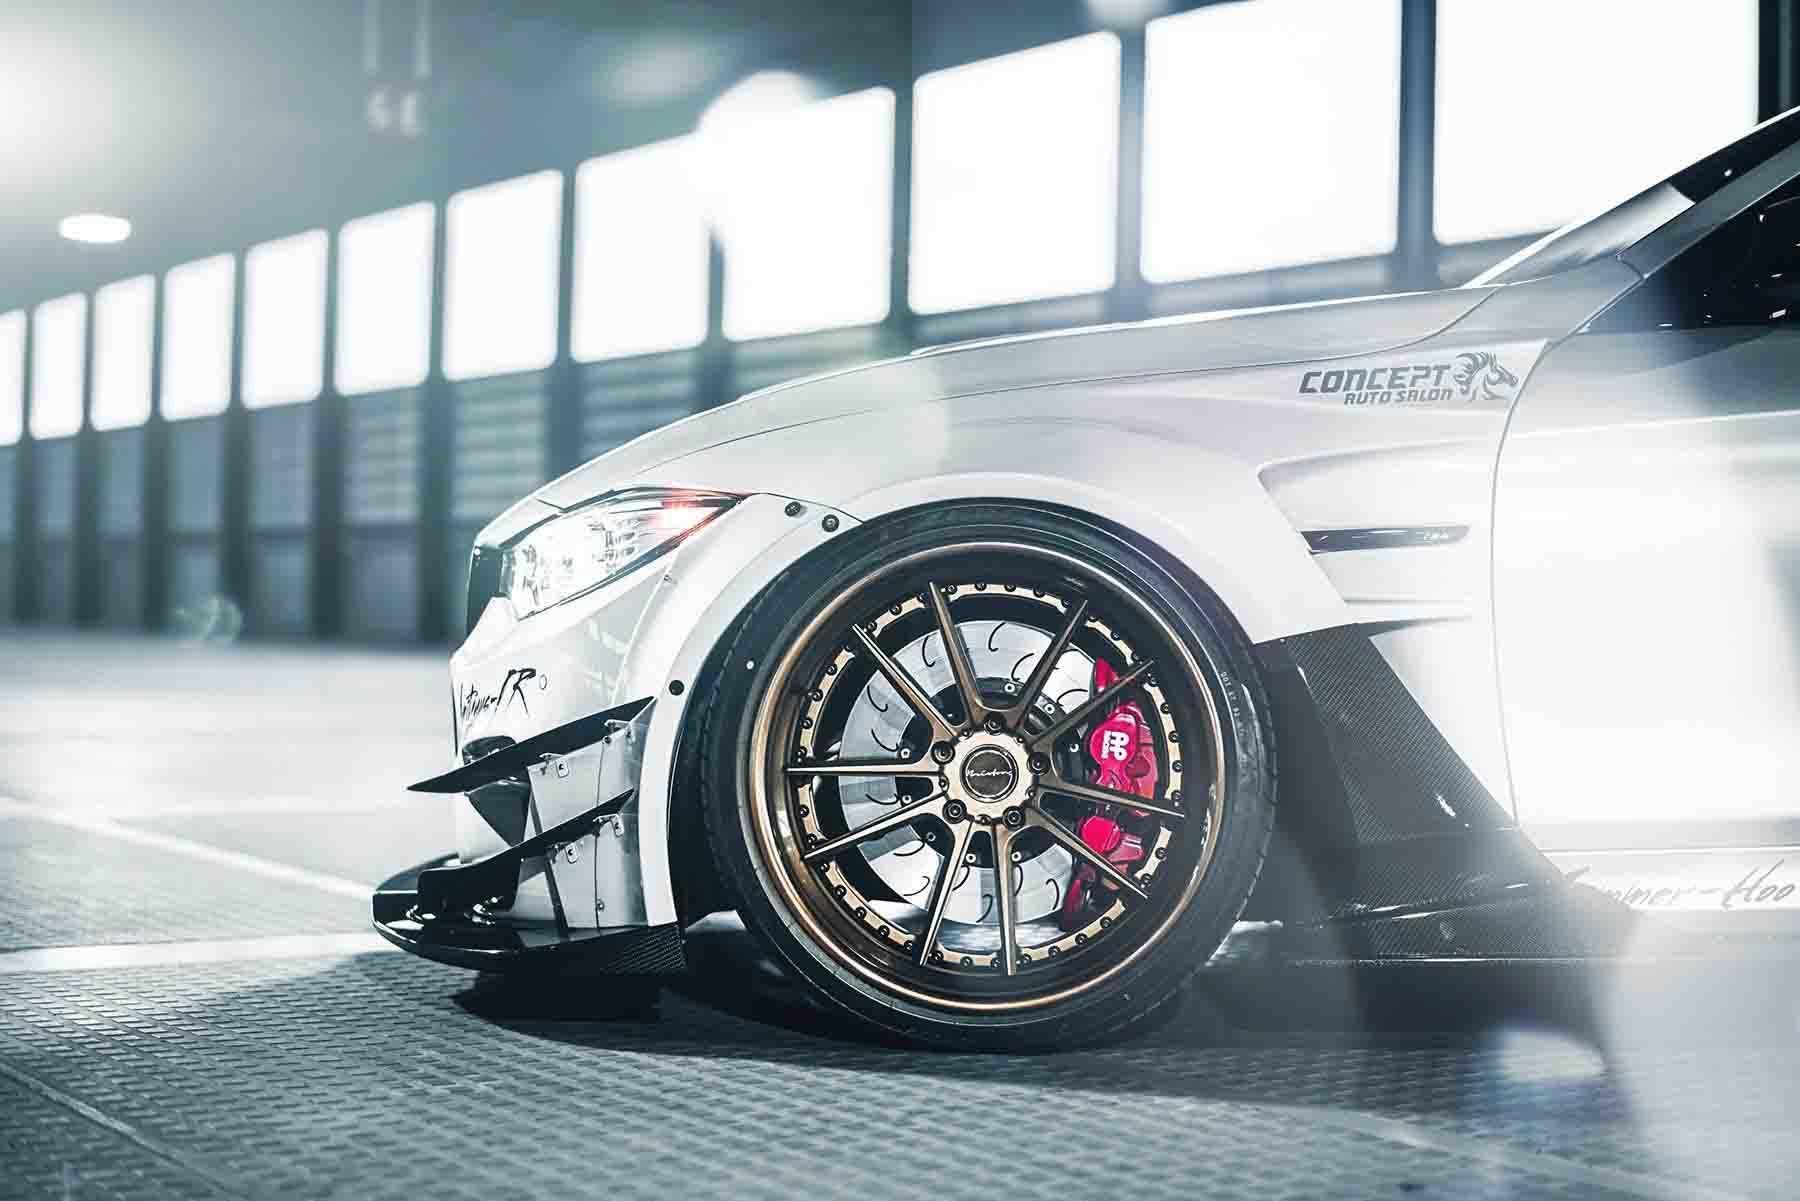 images-products-1-2165-232974453-brixton-forged-m51-targa-series-forged-wheels-varis-bmw-f82-m4-white-bronze-wheels-1800x1201.jpg